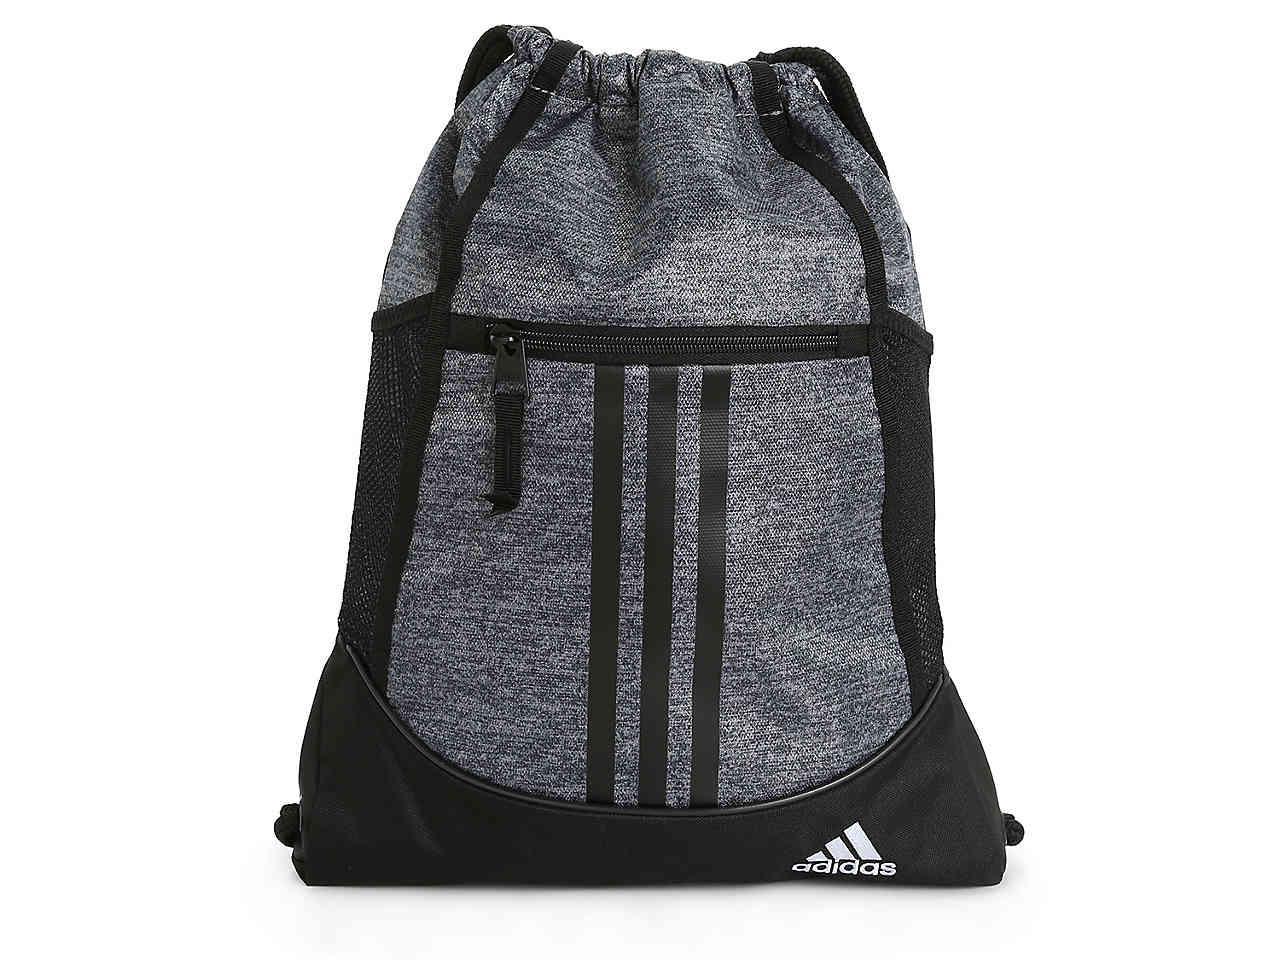 ca91f21eebbf Lyst - adidas Alliance Ii Backpack in Black